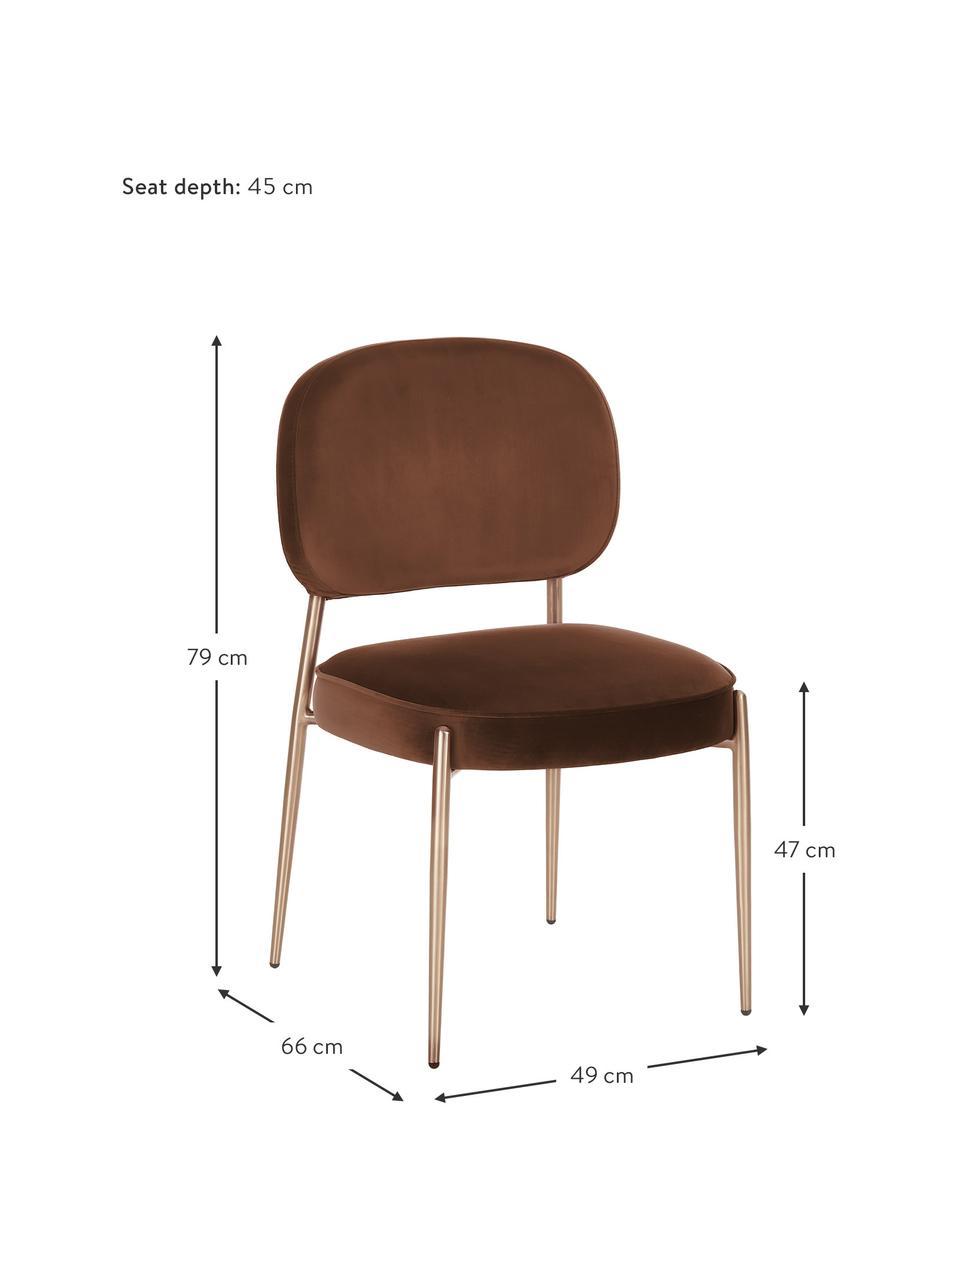 Sedia imbottita in velluto Viggo, Rivestimento: velluto (poliestere) La c, Velluto marrone, Larg. 49 x Prof. 66 cm